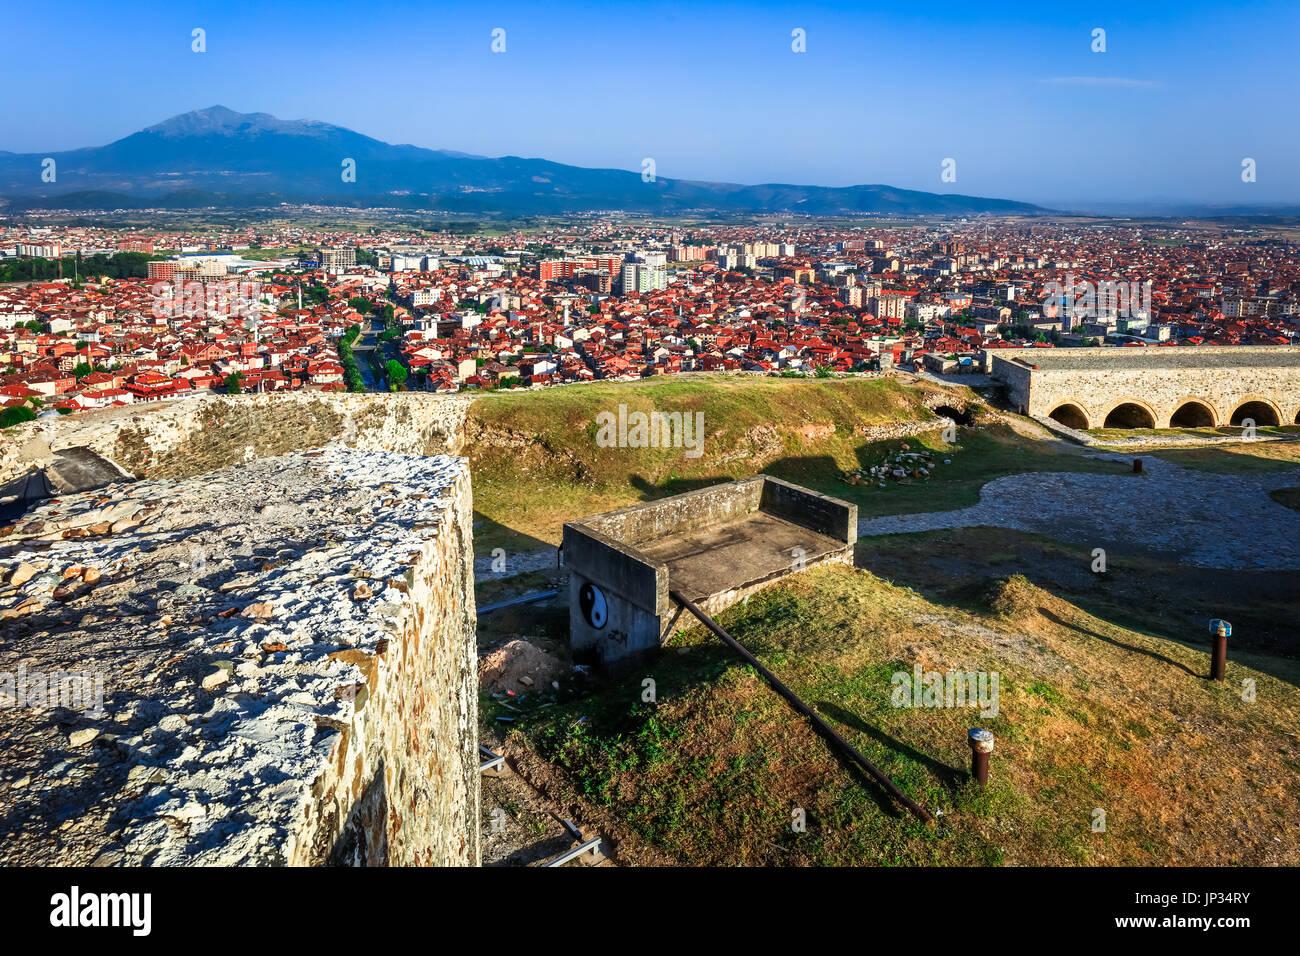 Europe, Kosovo, Prizren, Historic city, Prizren Fortress, Призренски град, Prizrenski grad, Kaljaja, Каlаја, Каљаја, Stock Photo